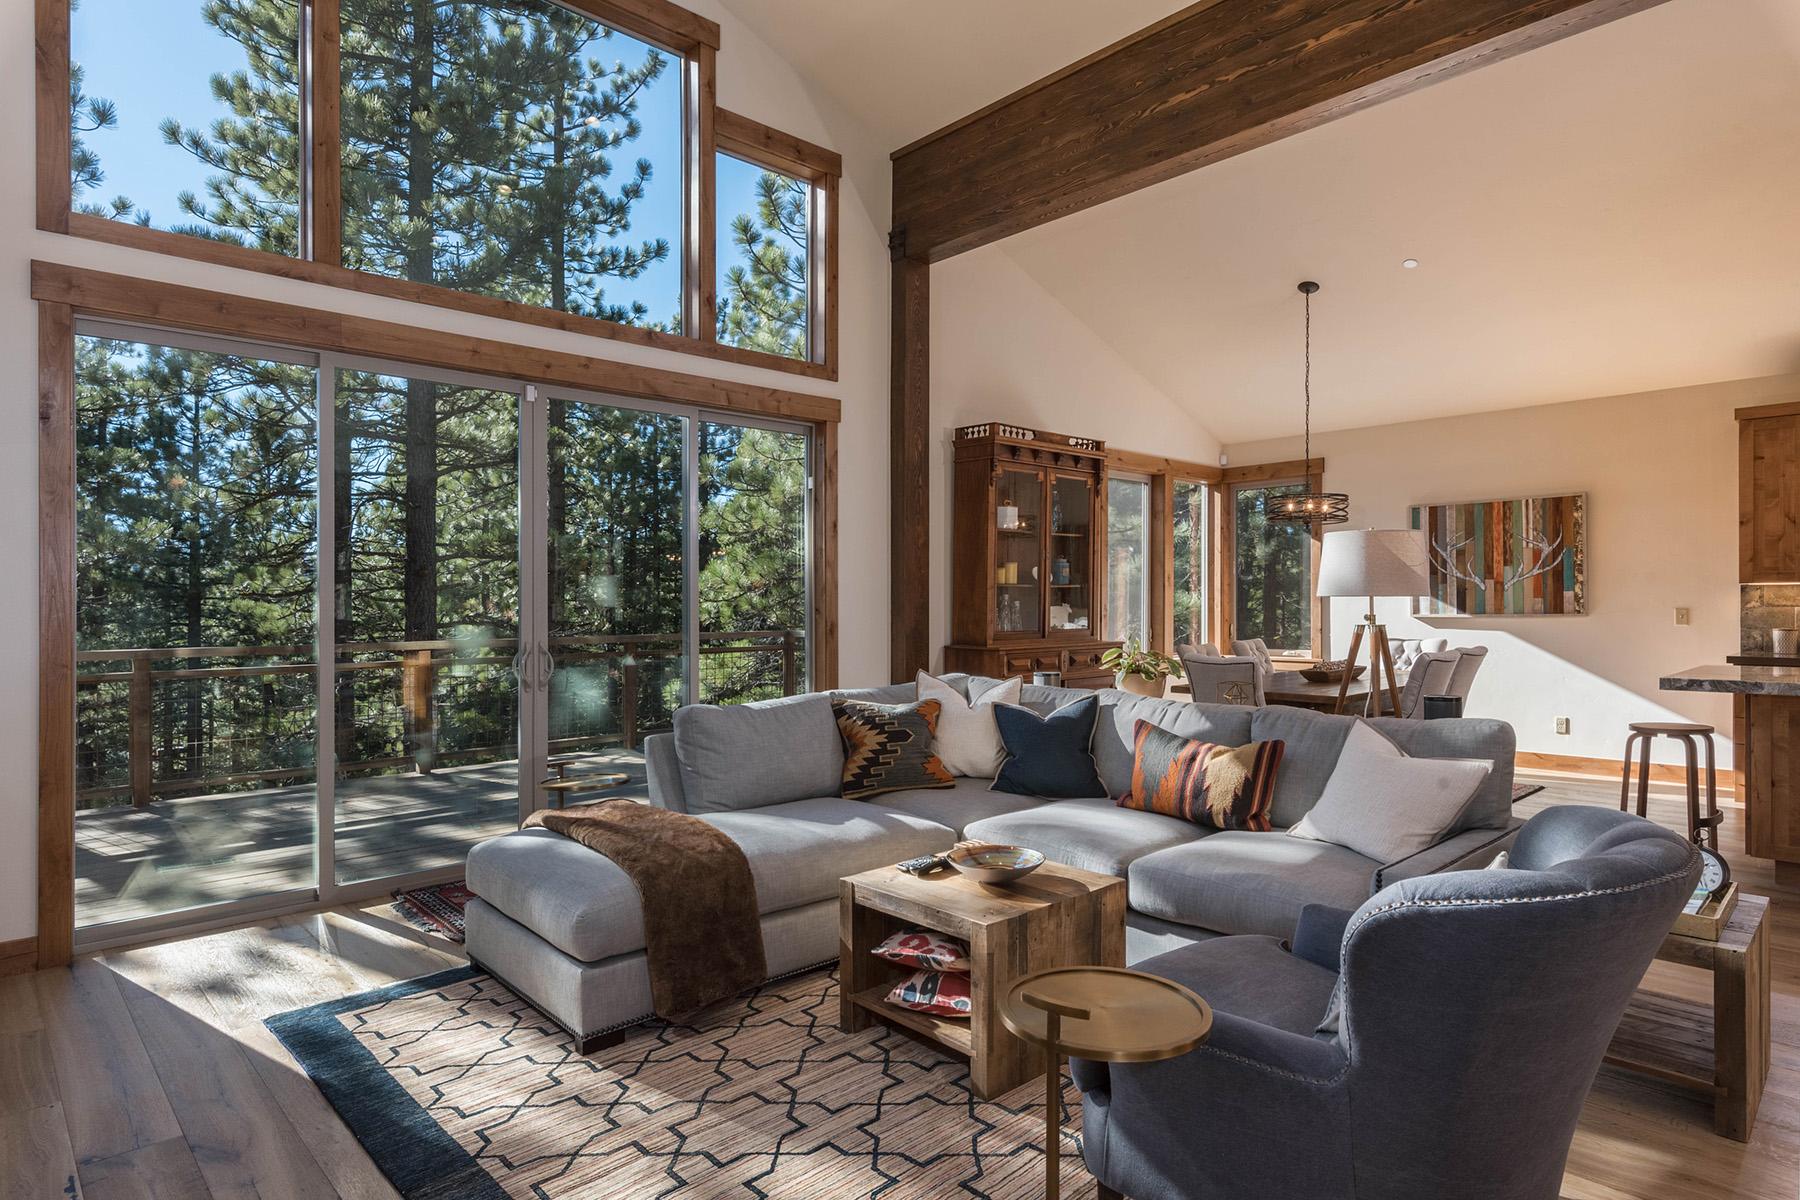 Villa per Vendita alle ore 11770 Snoweak Way 11770 Snowpeak Way Truckee, California, 96161 Stati Uniti